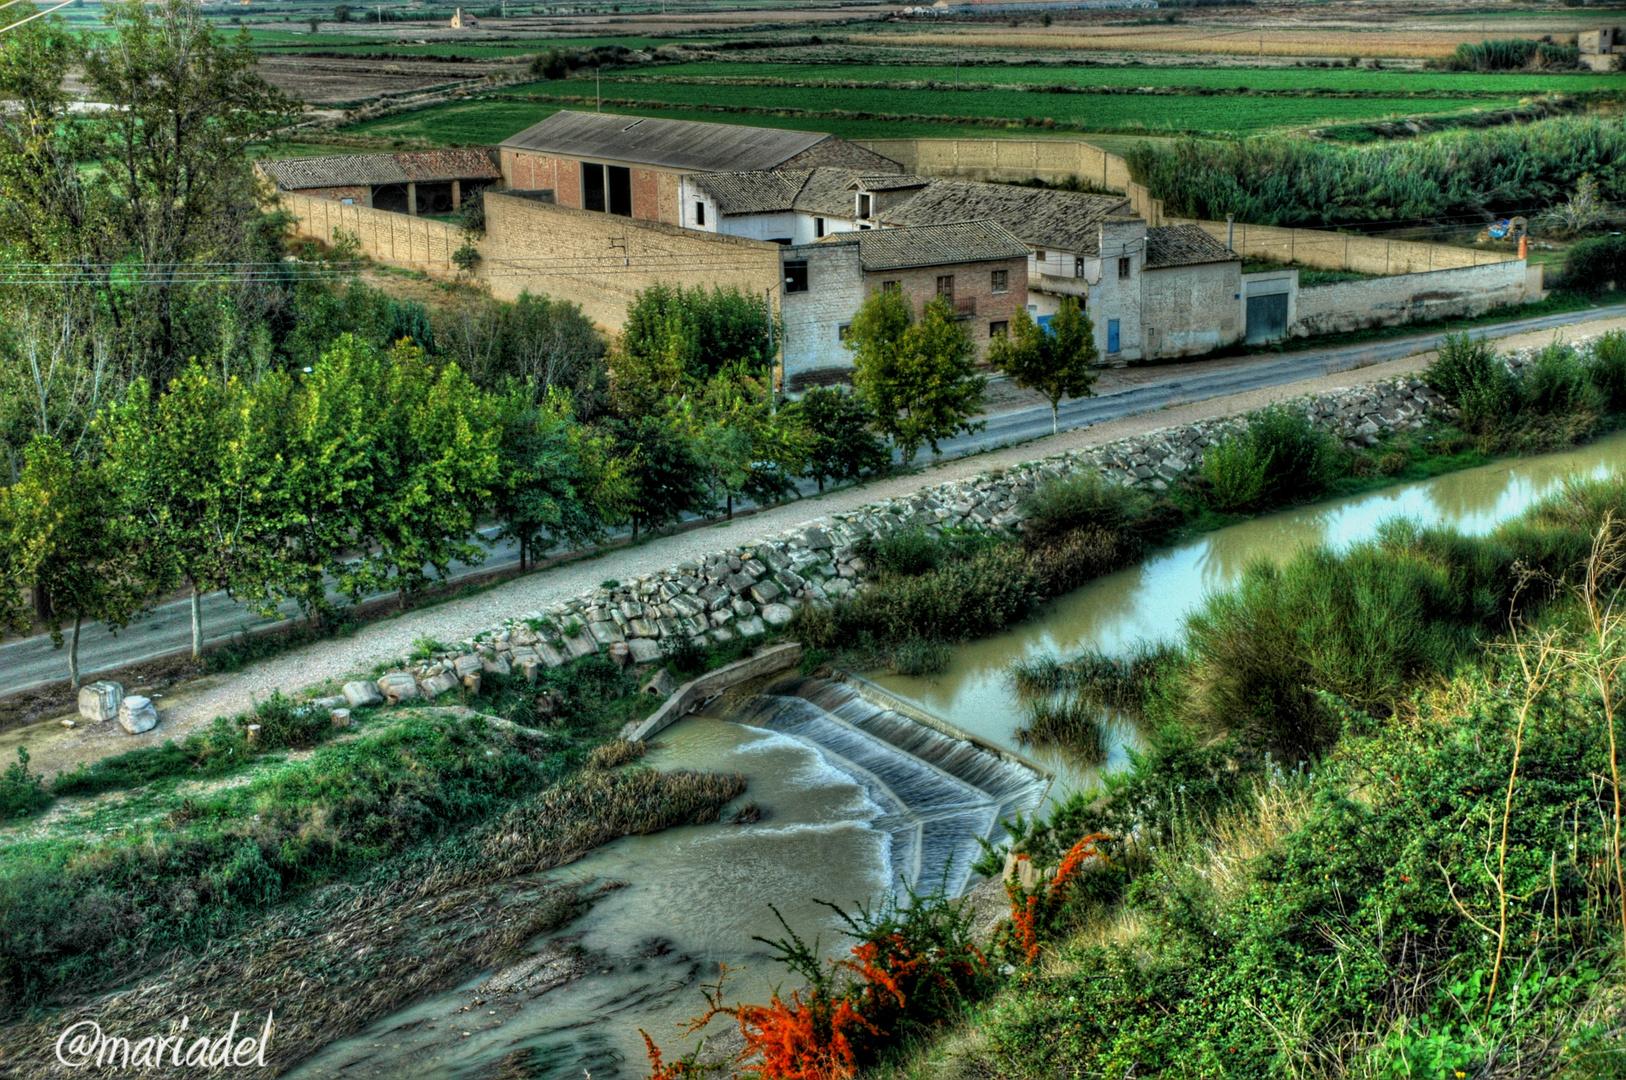 Río Arba